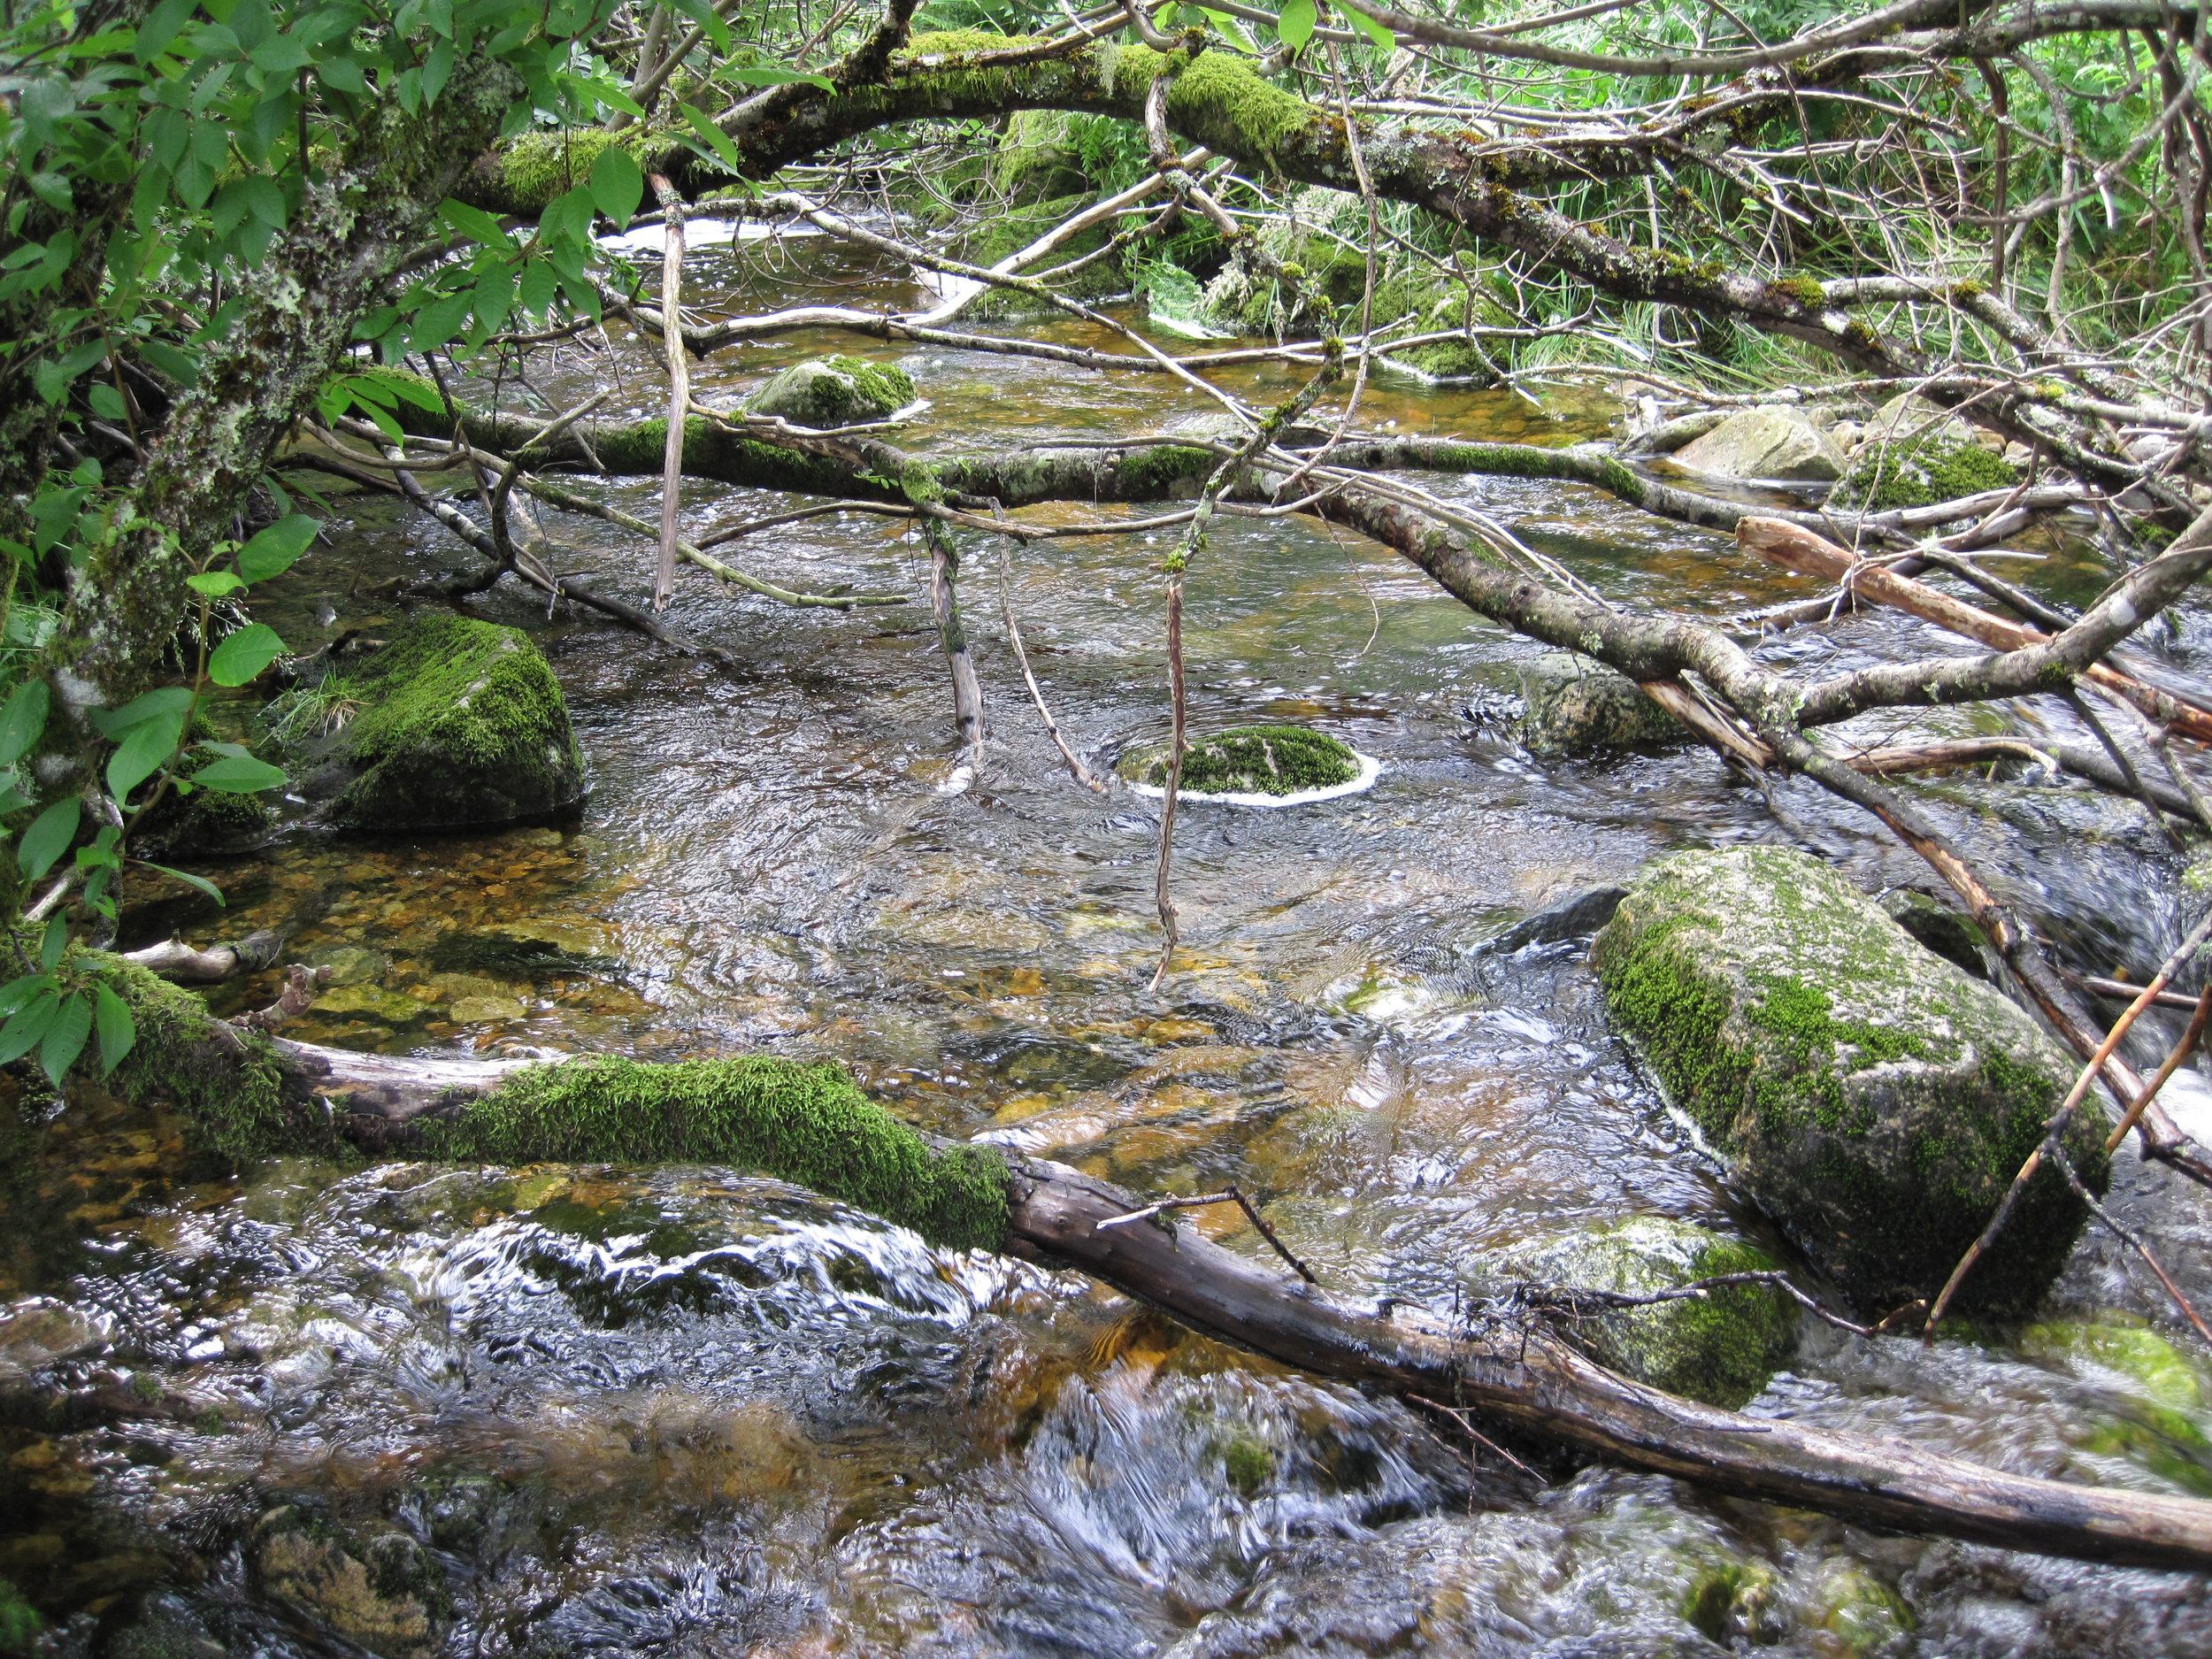 En produktiv gytebekk for sjø-ørret, med masse skjul, gytegrus, stei, døde og levende trær  Foto: Ulrich Pulg, Uni Miljø